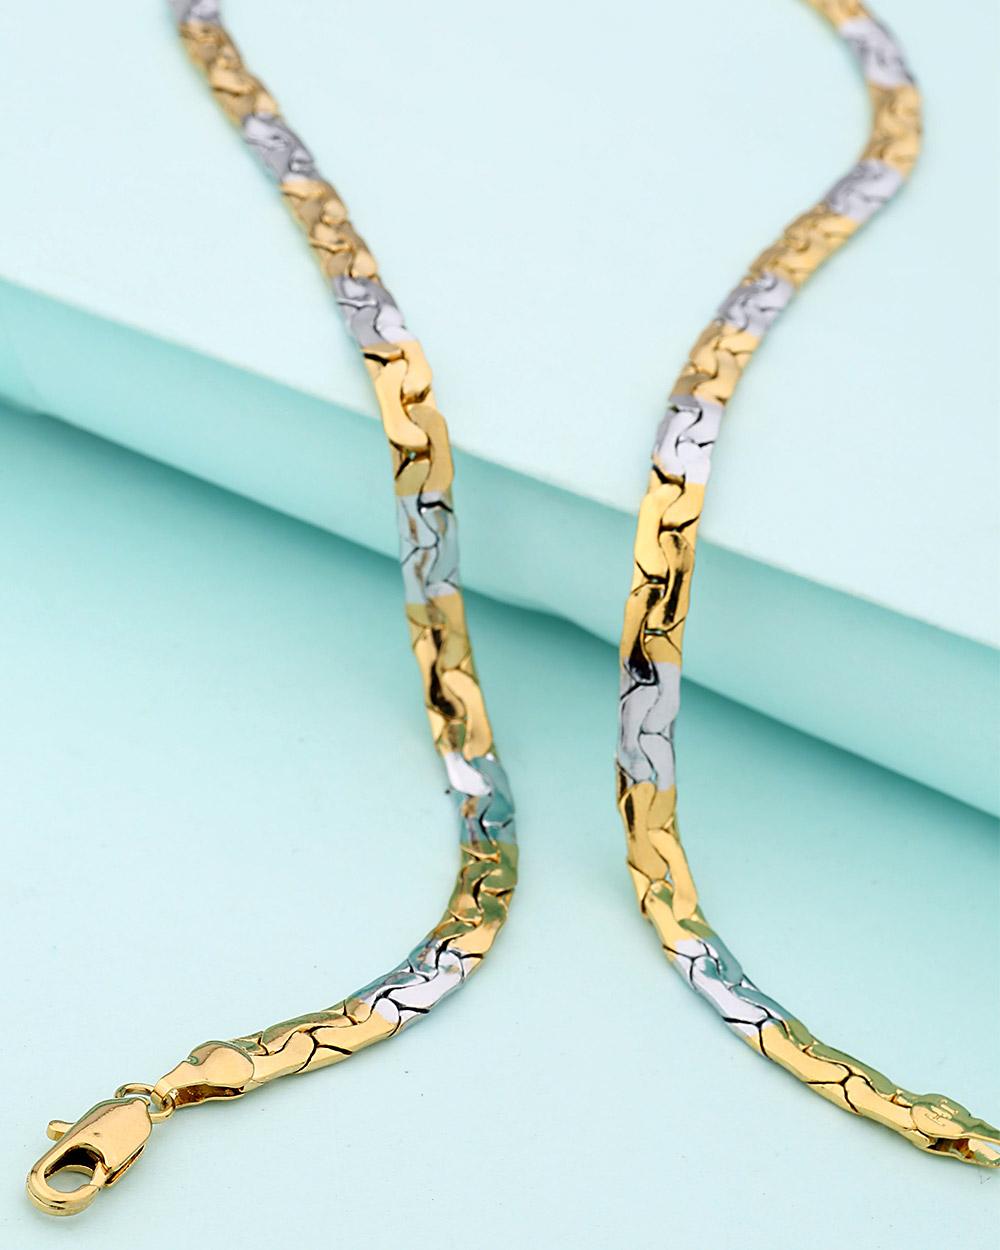 Dual Tone Stylish Designer Chain For Men | Buy Designer & Fashion ...